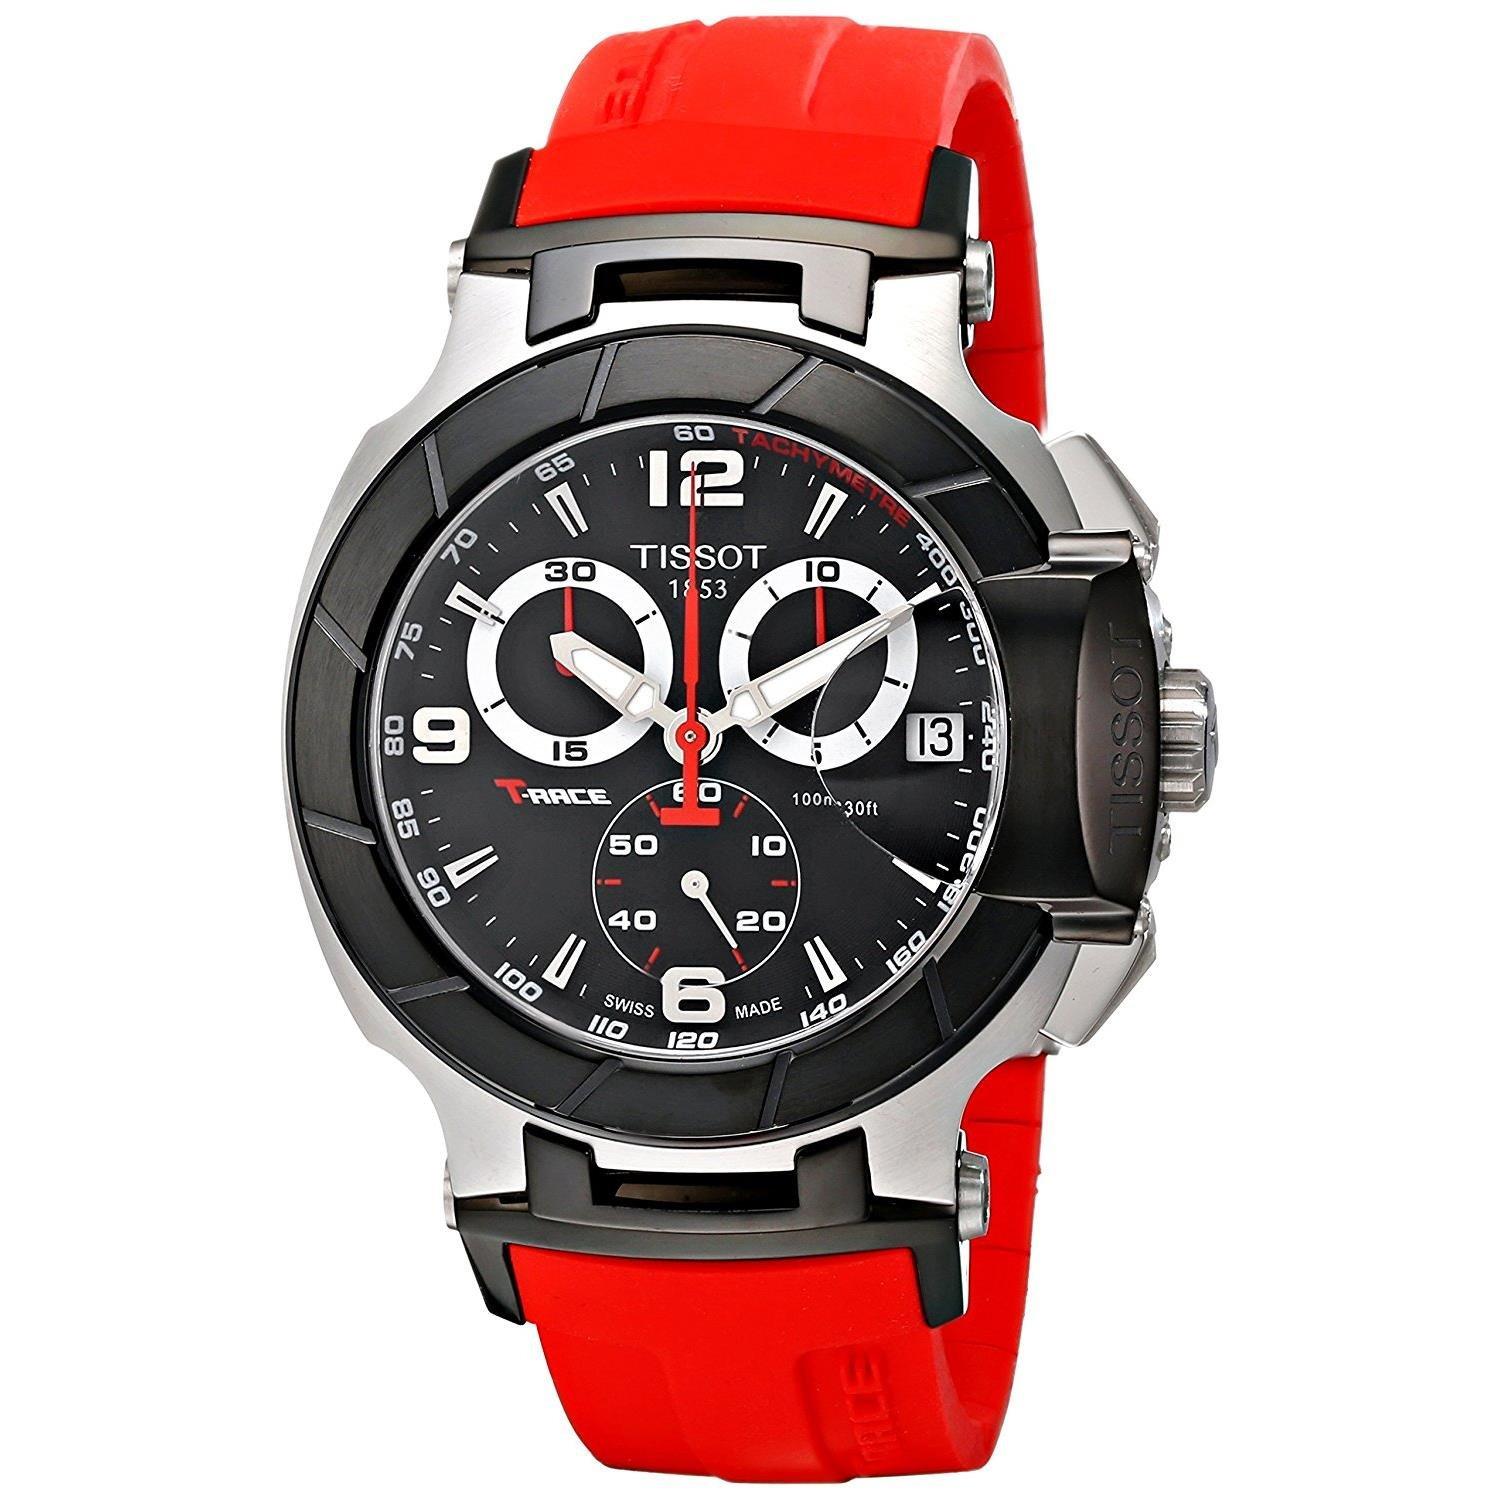 Tissot T-Race T0484172705701 - Reloj de Caballero de Cuarzo, Correa de Caucho